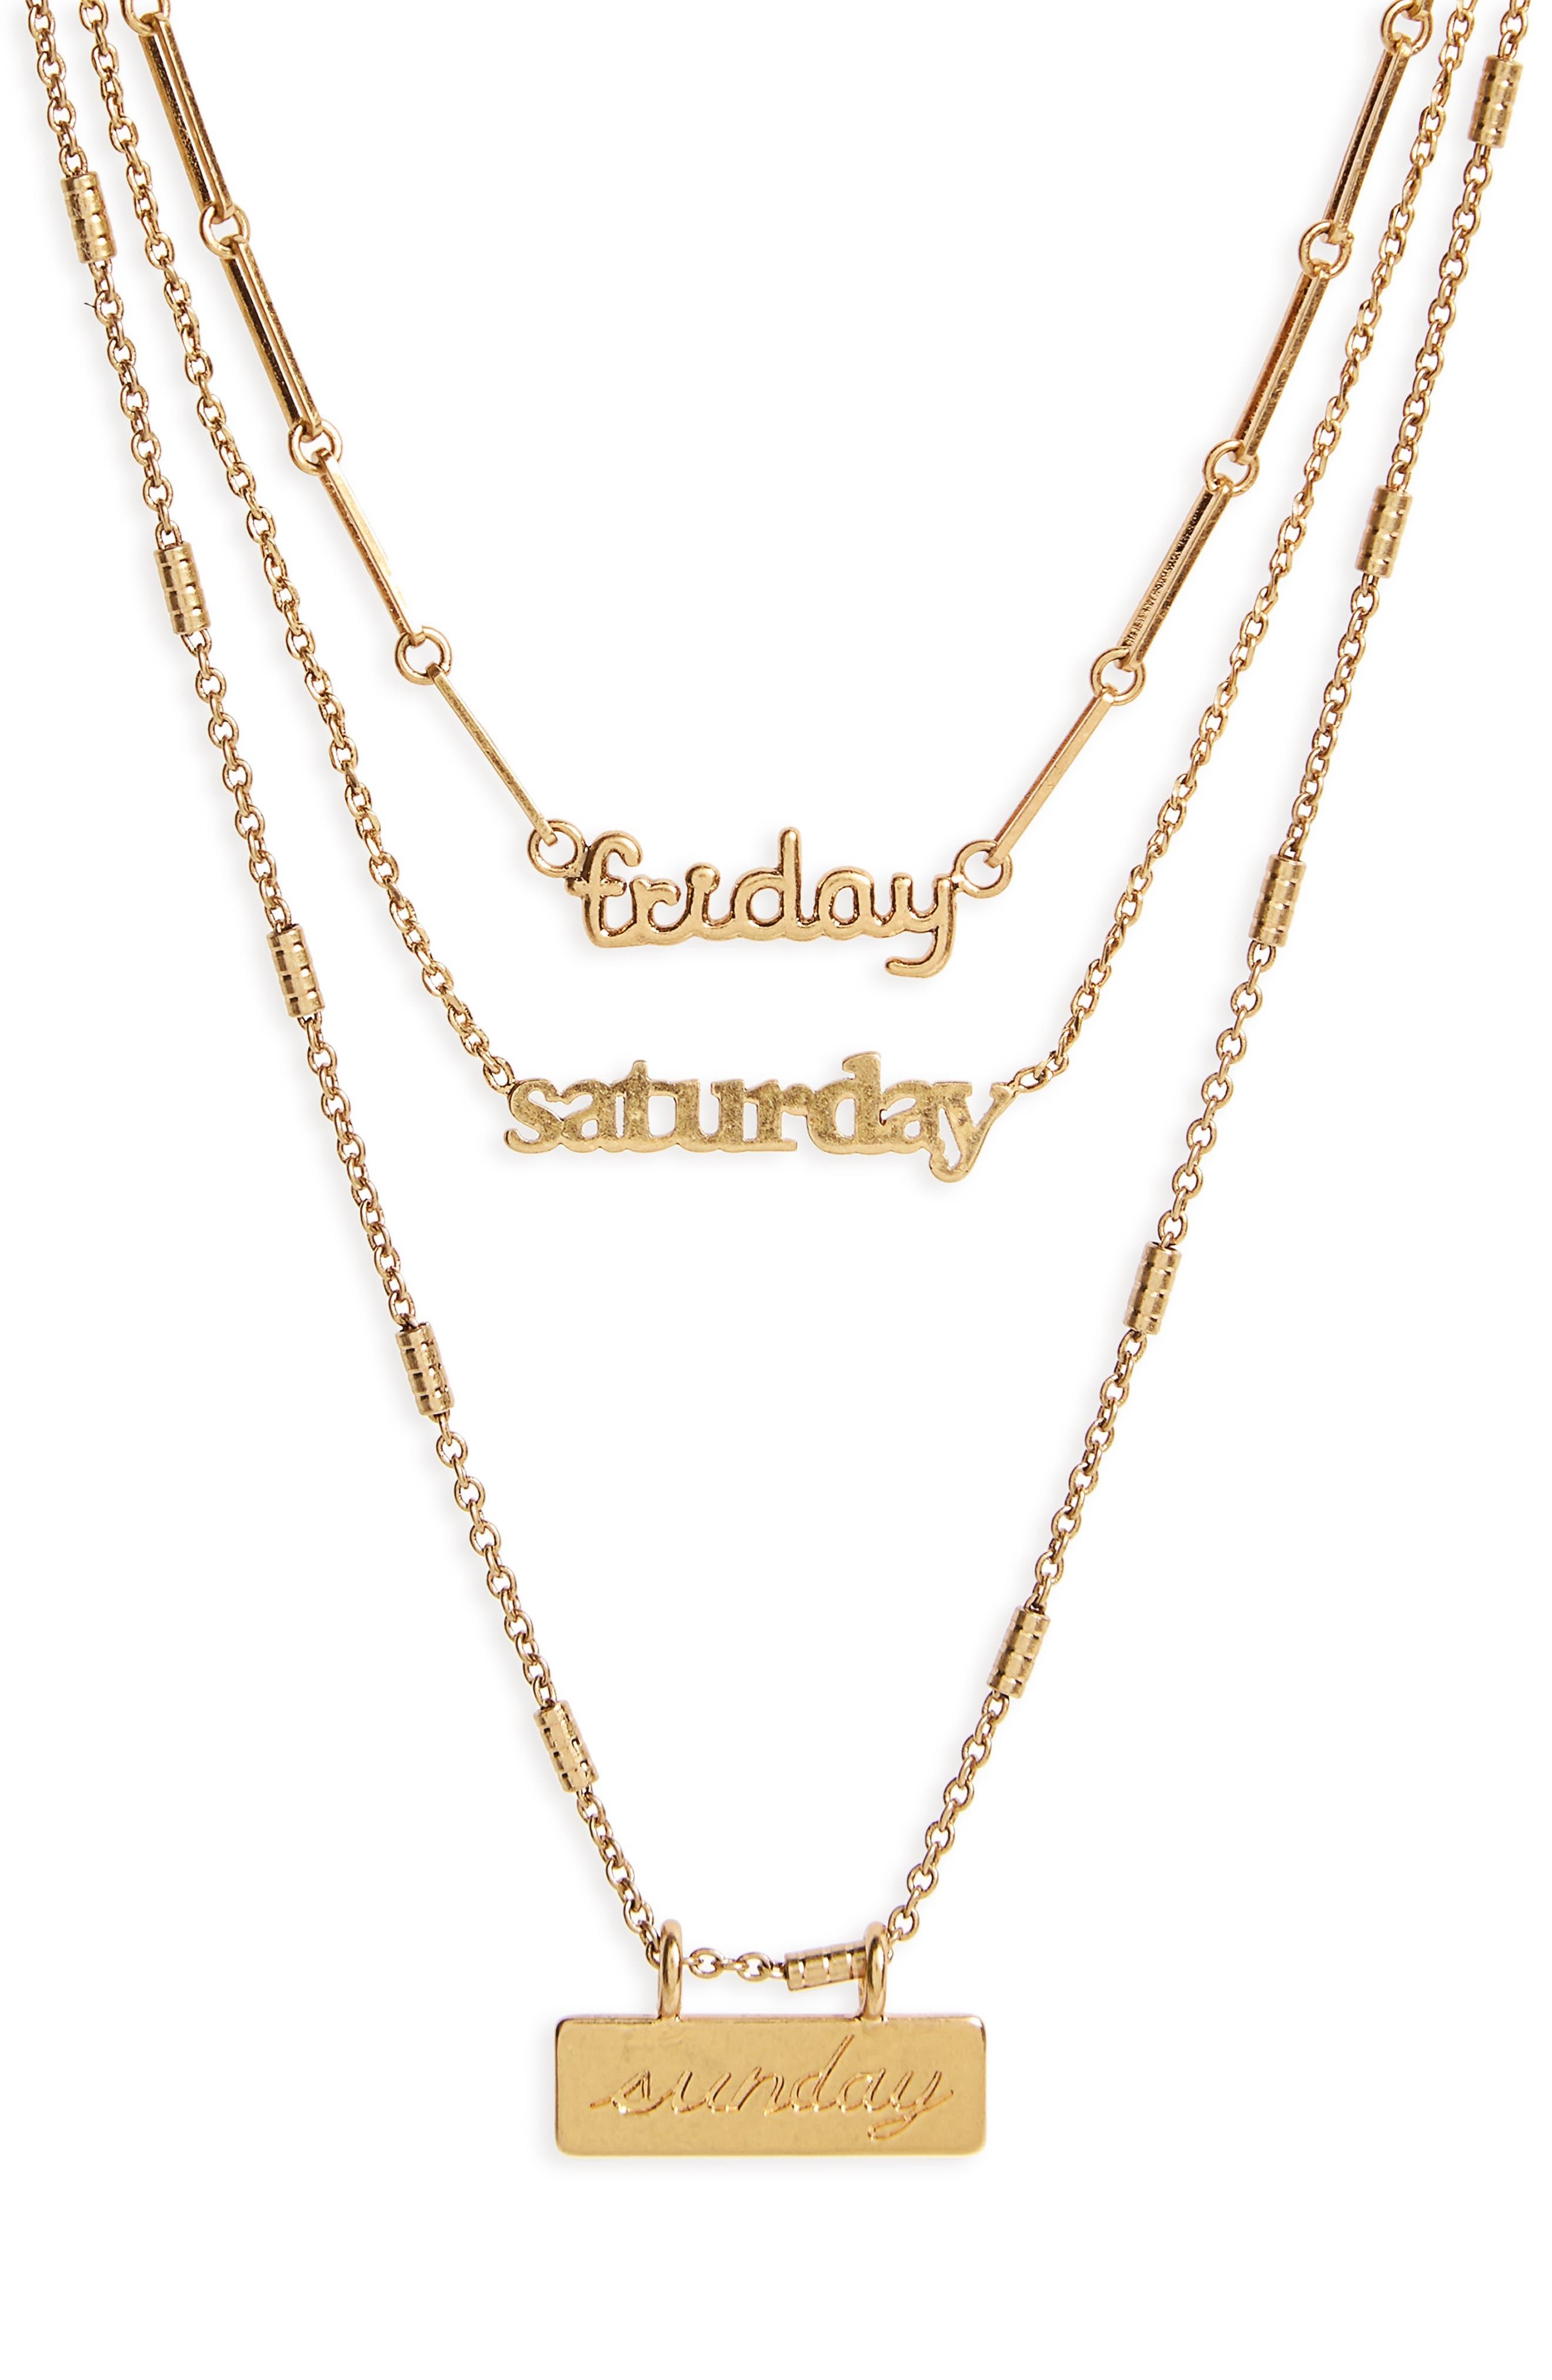 Friday Saturday Sunday Necklace Set,                             Main thumbnail 1, color,                             710